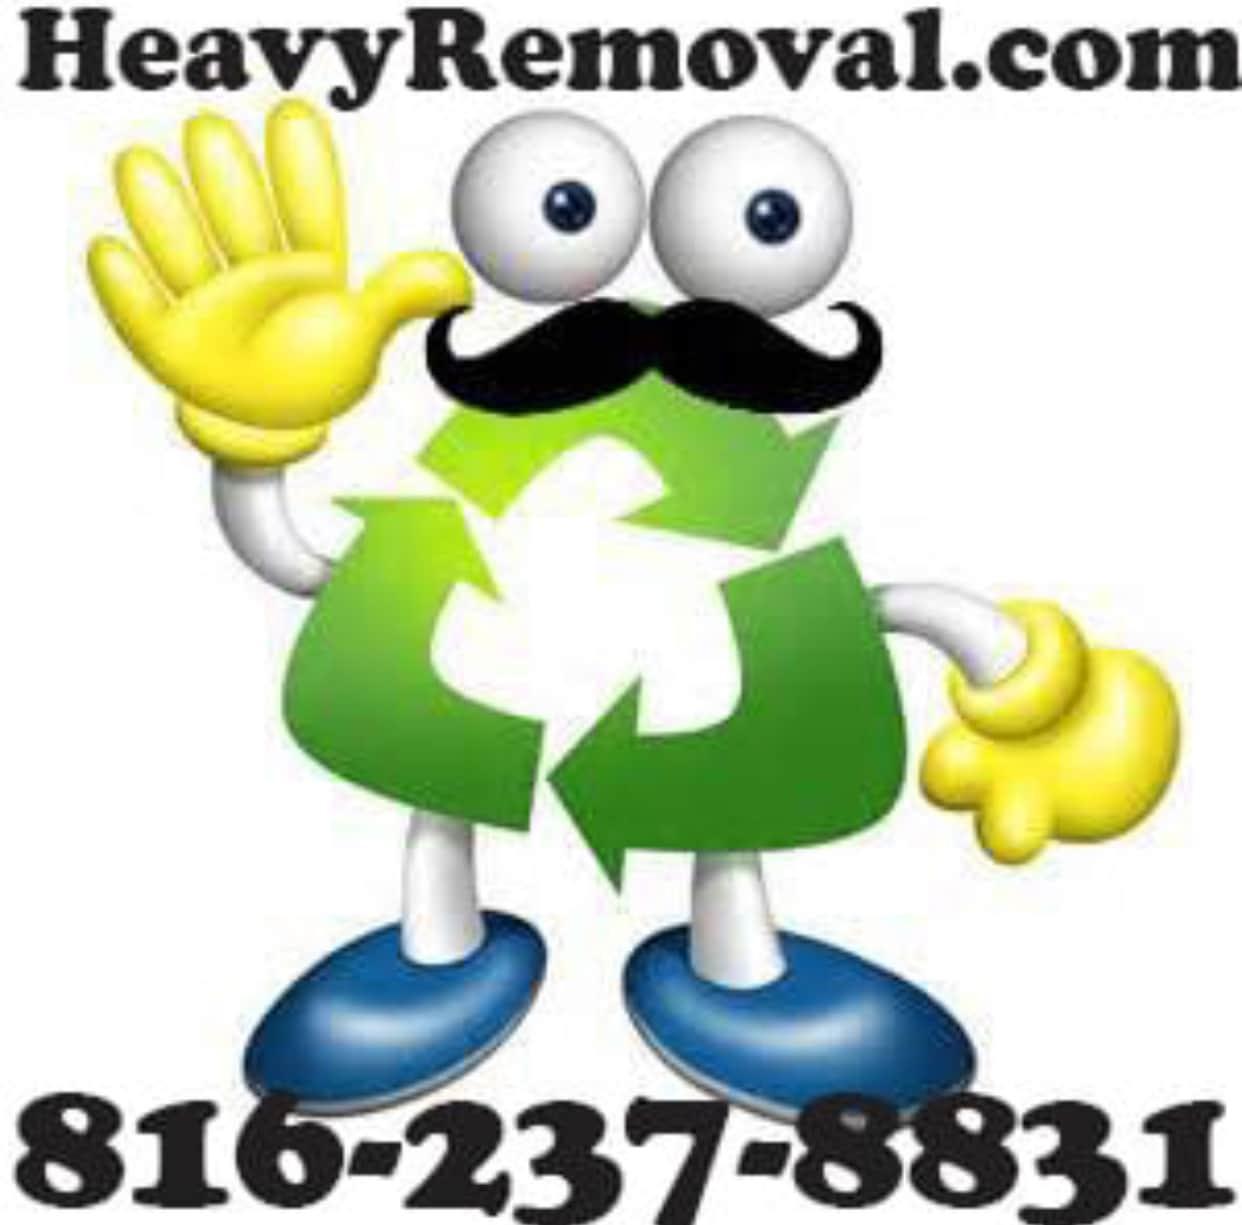 HeavyRemoval.com